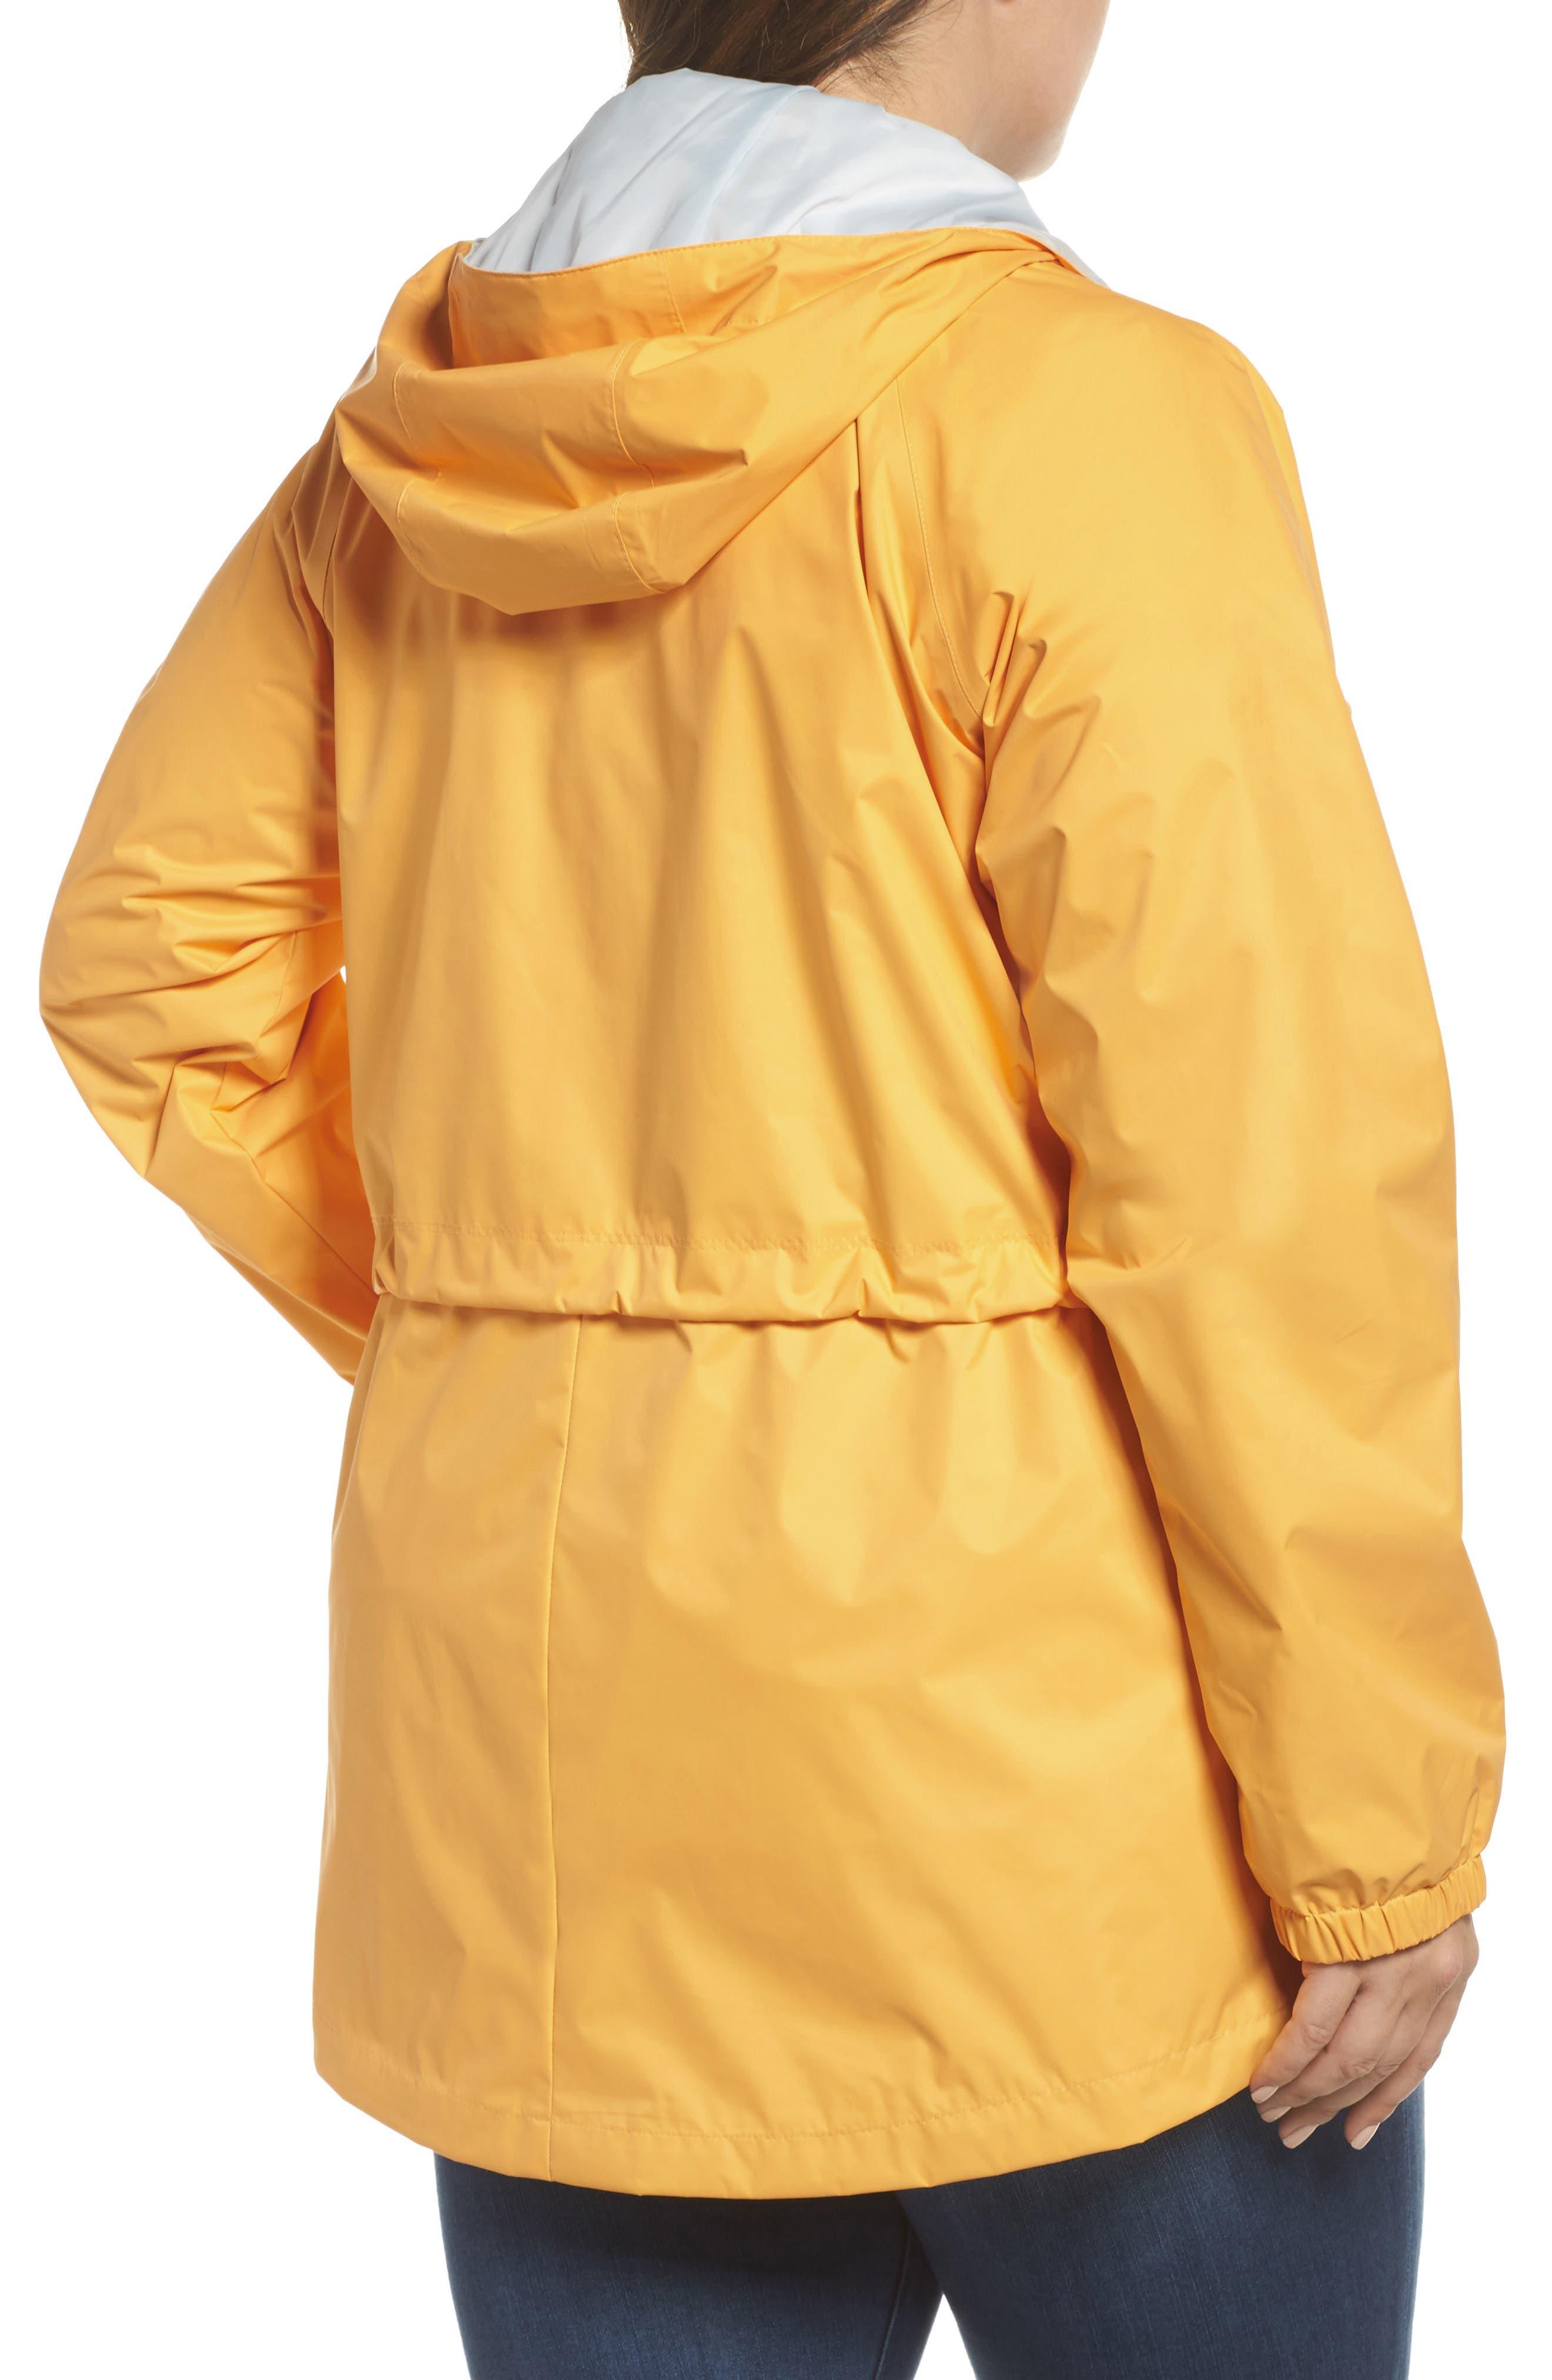 'Arcadia' Hooded Waterproof Casual Jacket,                             Alternate thumbnail 2, color,                             Yellow Ray Cirrus Grey